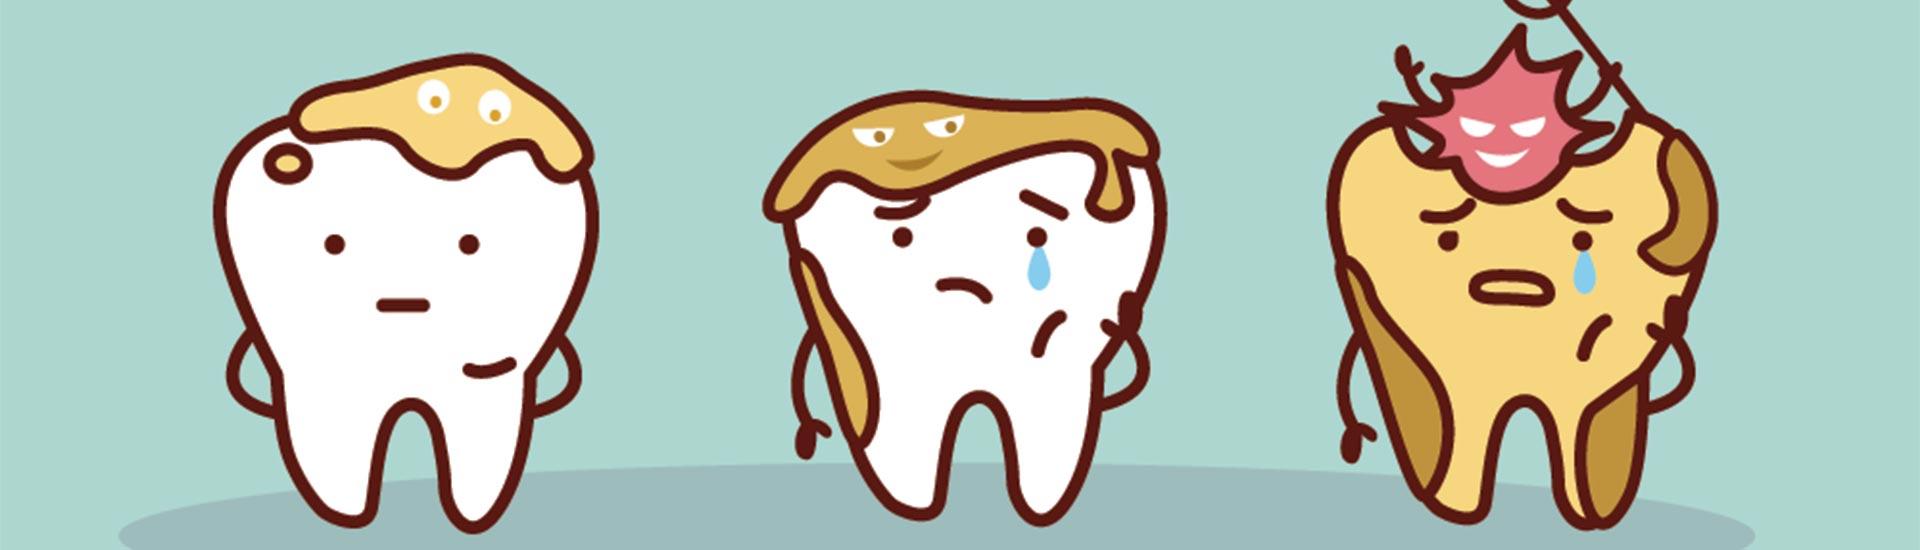 Why Do I Get So Many Cavities?